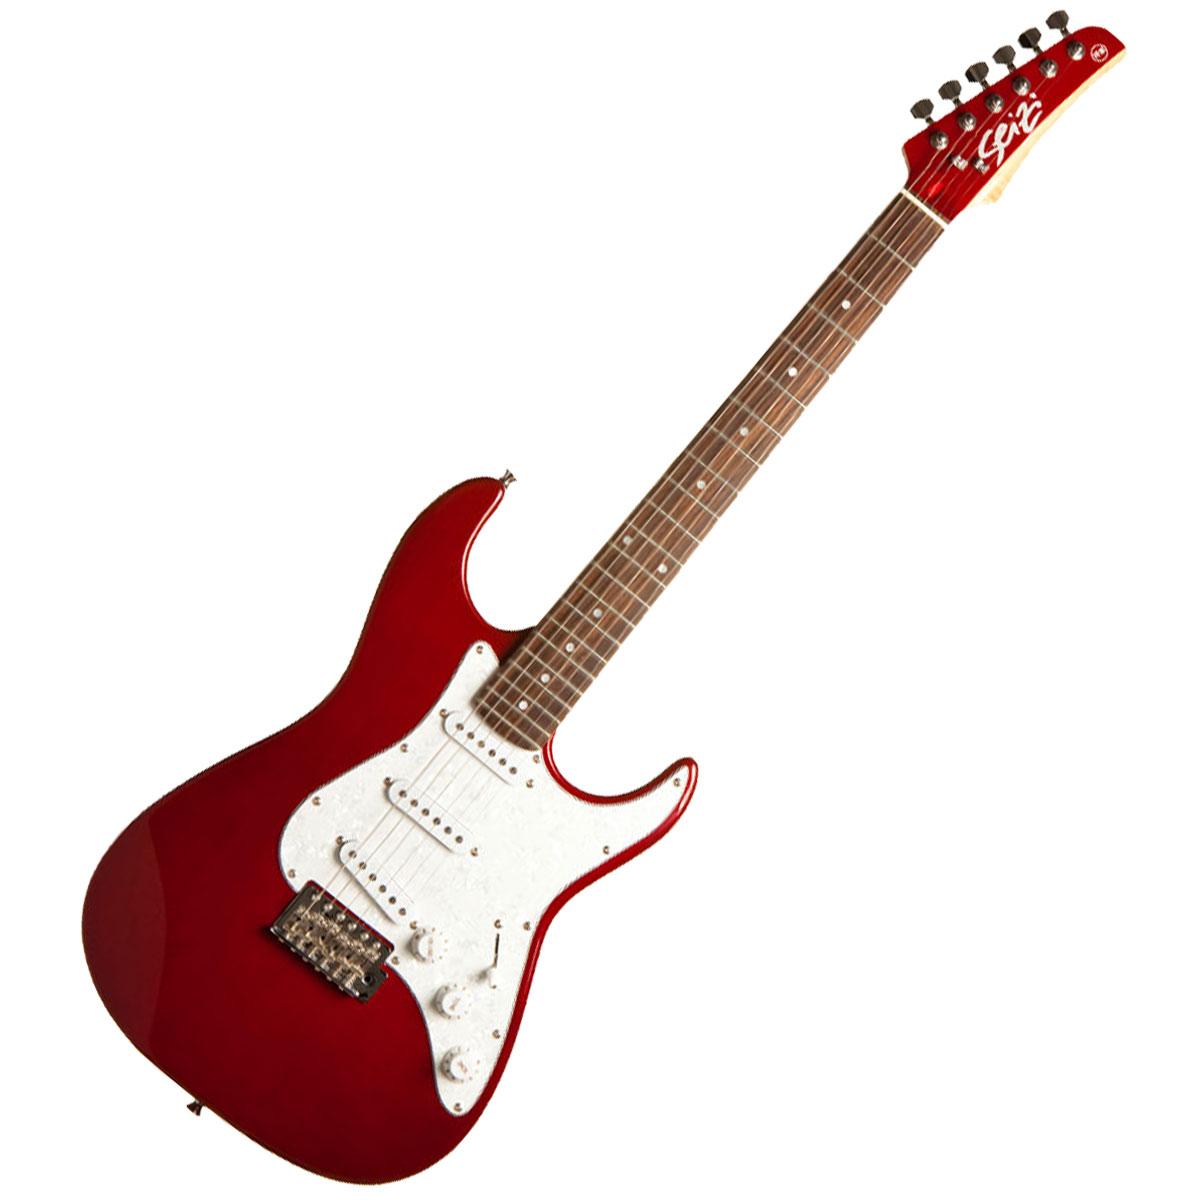 Guitarra Vision RW Metallic Red c/ Escudo Branco Perolado - Seizi